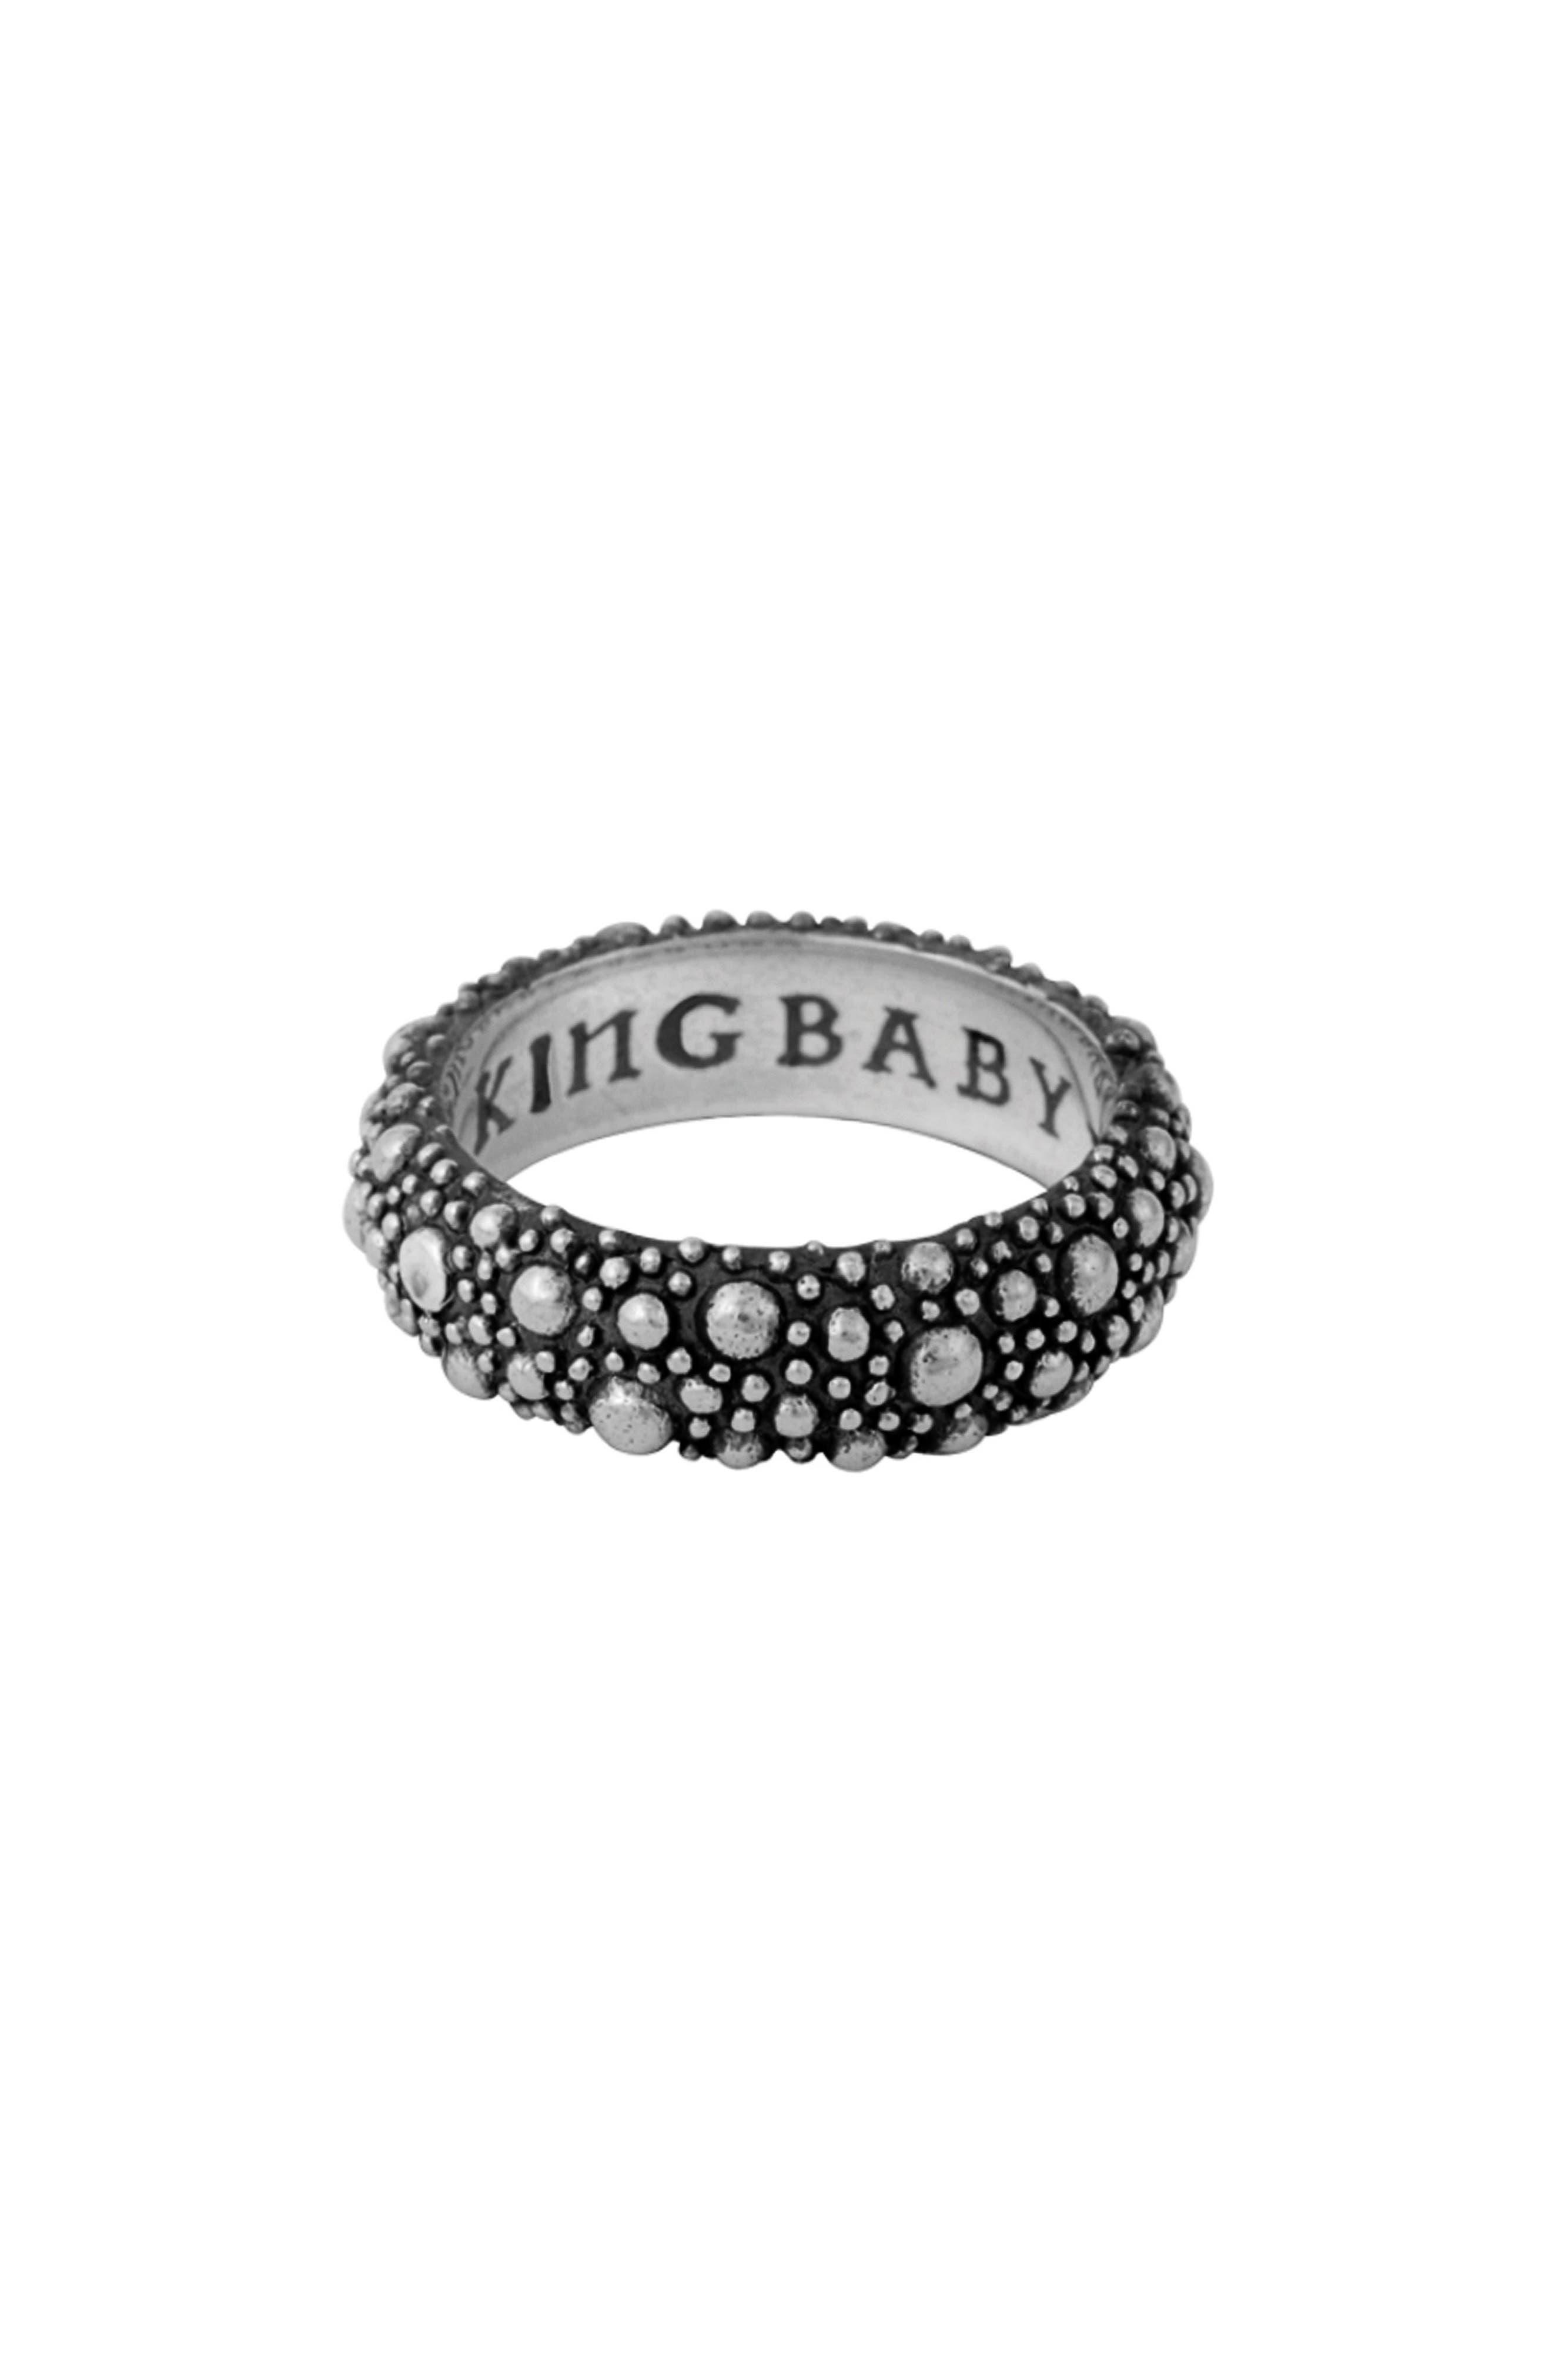 Main Image - King Baby Stingray Ring